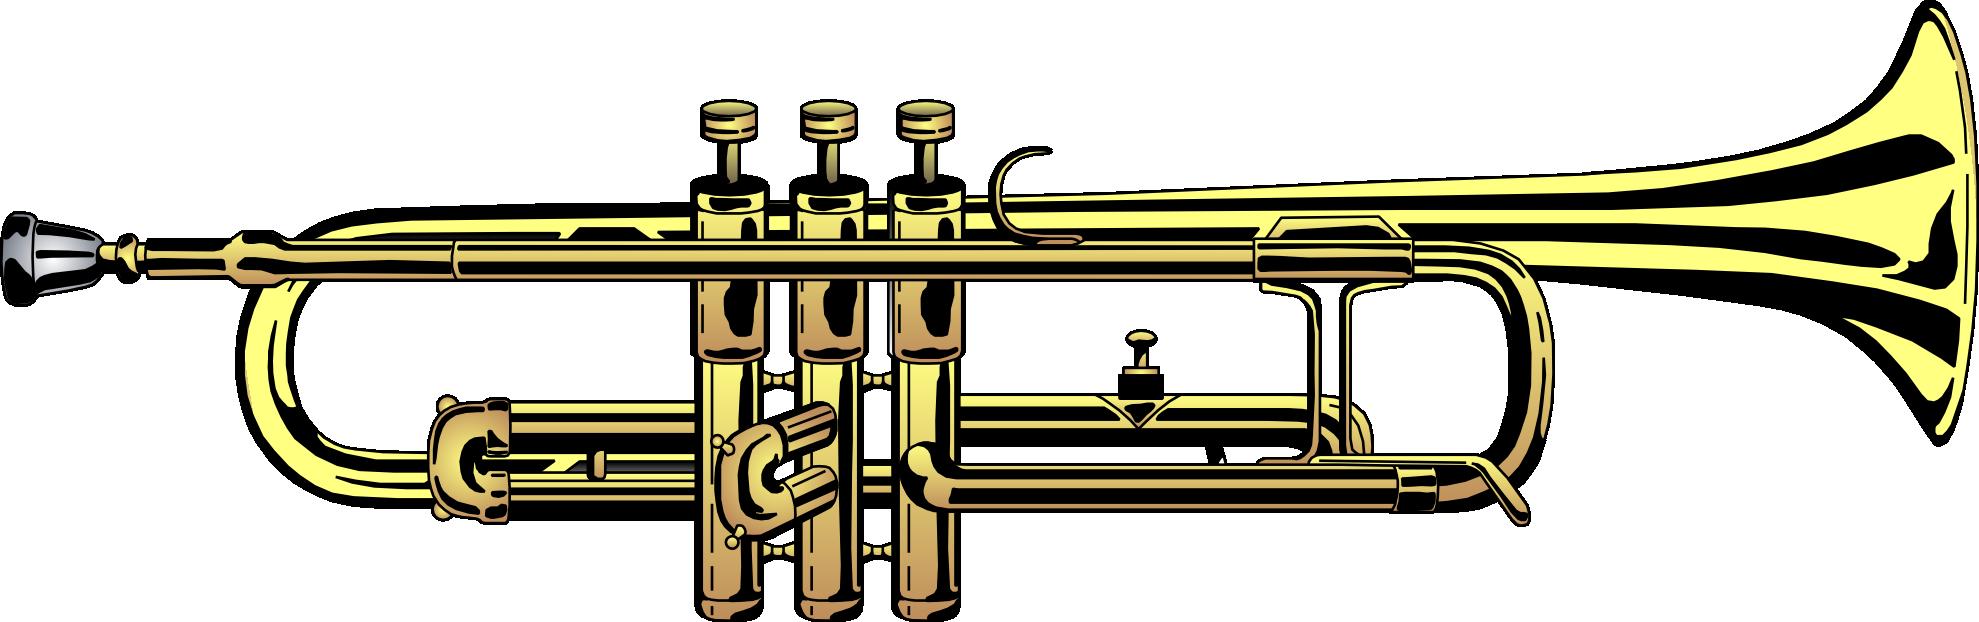 Pocket clipart vector. Trumpet silhouette clip art